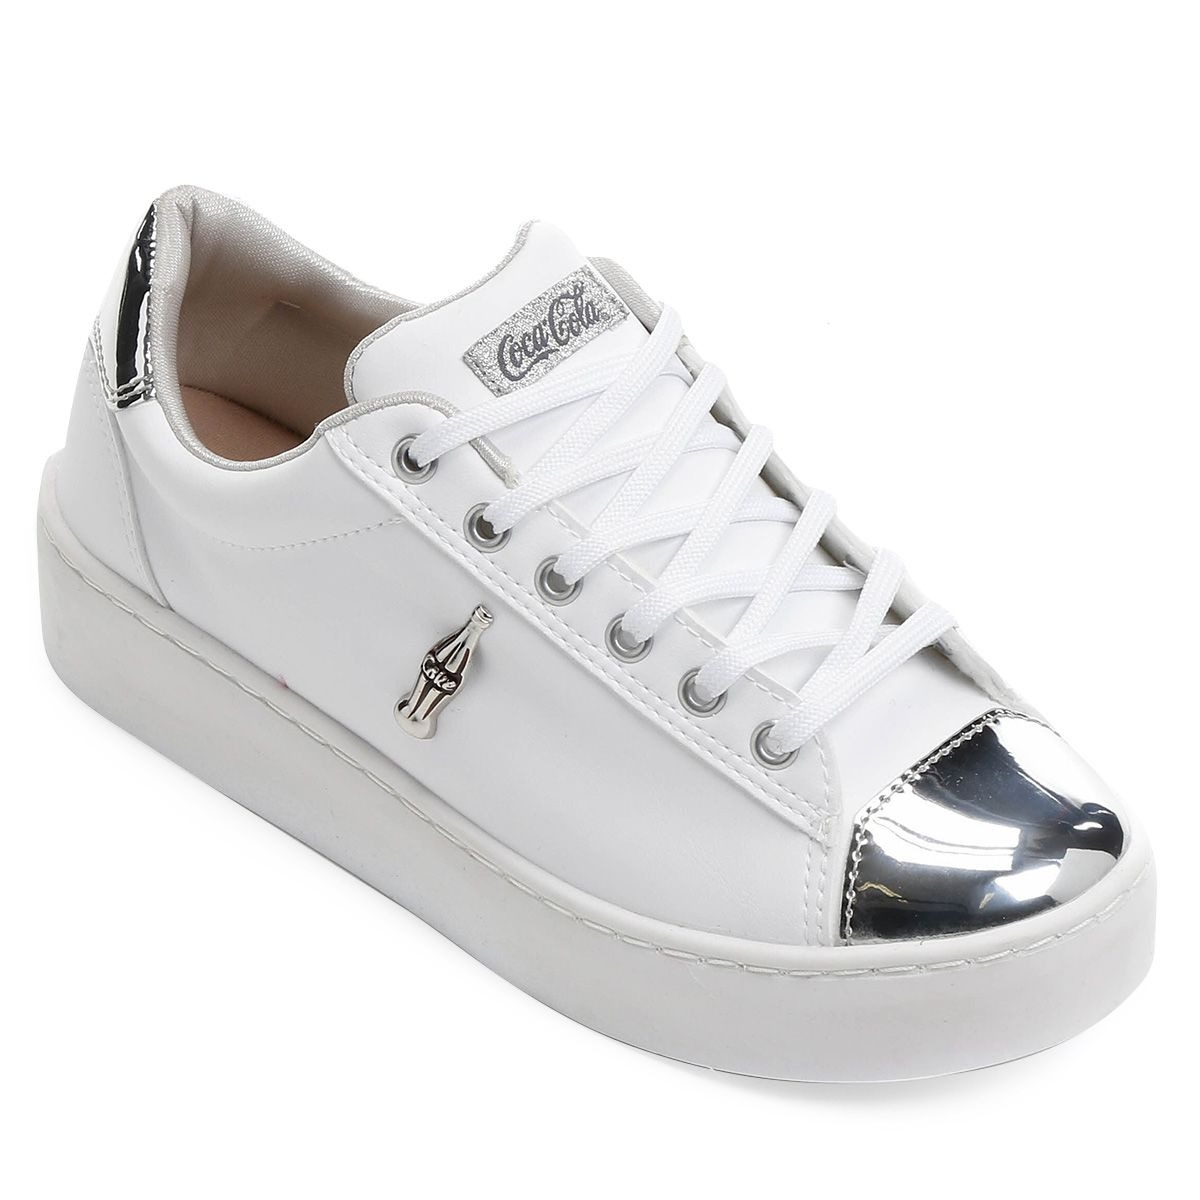 d44176dcaa70c Tênis Coca Cola Shoes Belle Winter Feminino - R$ 218,90 em Mercado Livre